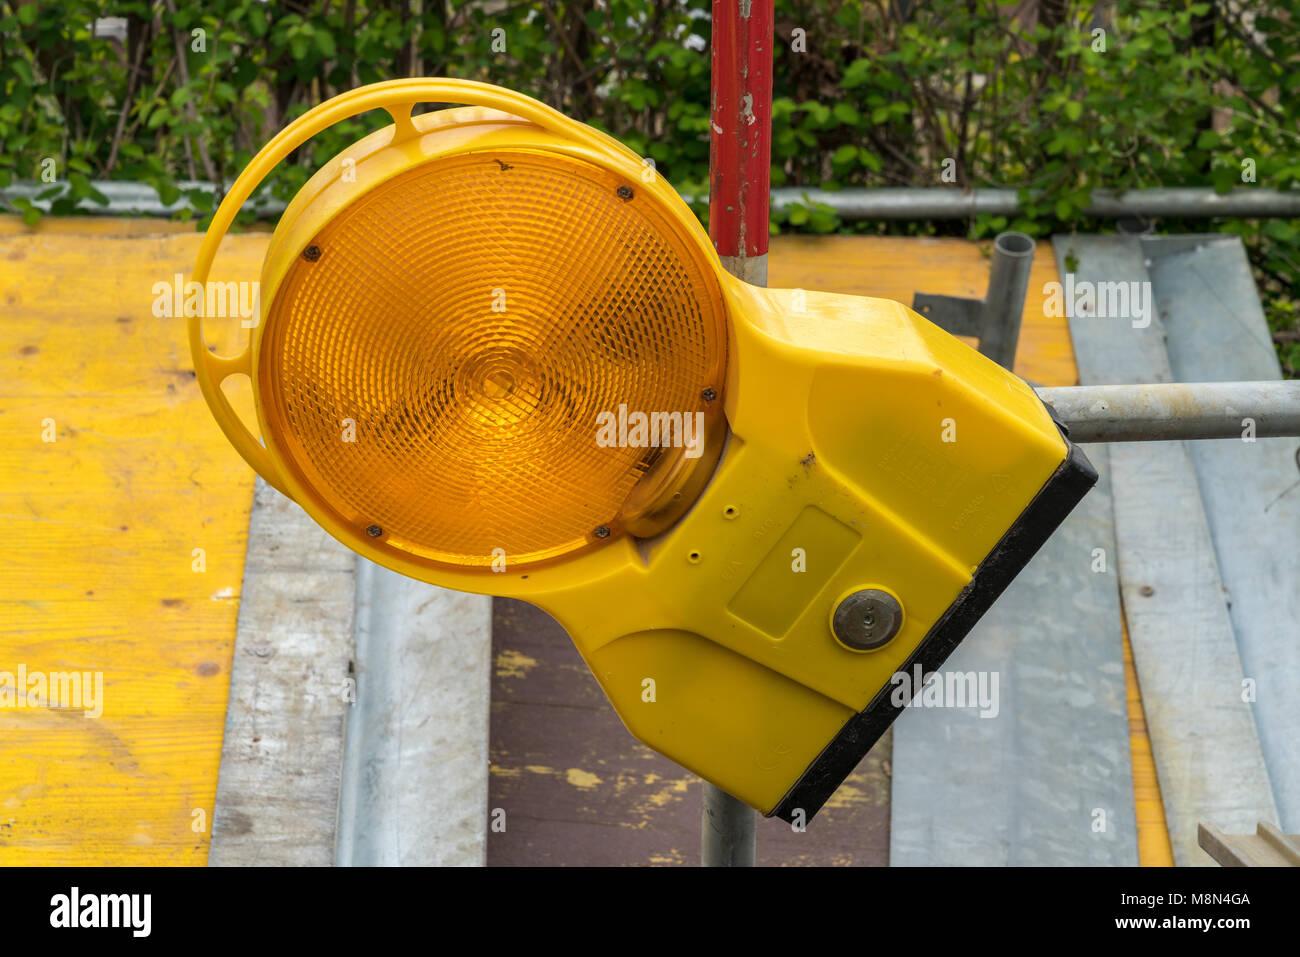 Gelsenkirchen, North Rhine-Westphalia, Germany - April 06, 2017: Warning light for construction site safety - Stock Image